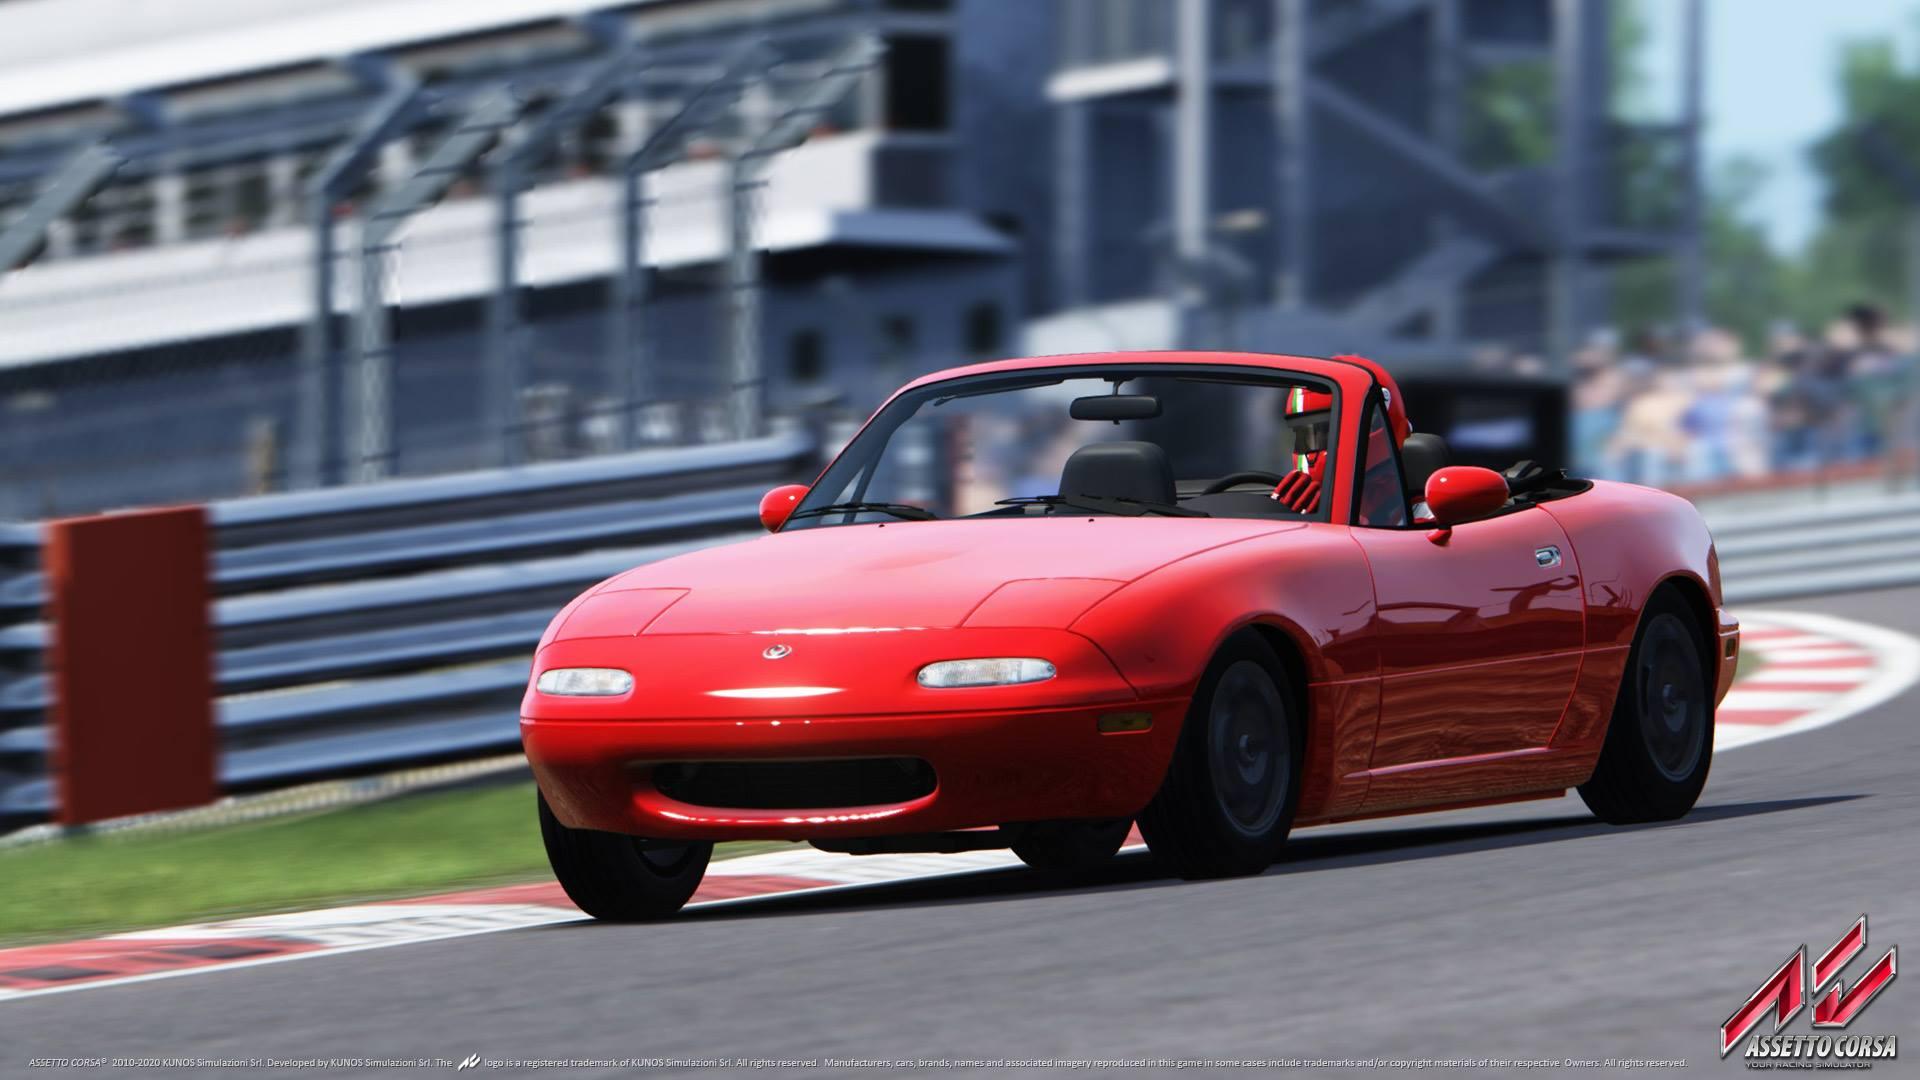 Assetto Corsa Update 1 13 & New Content Released – VirtualR